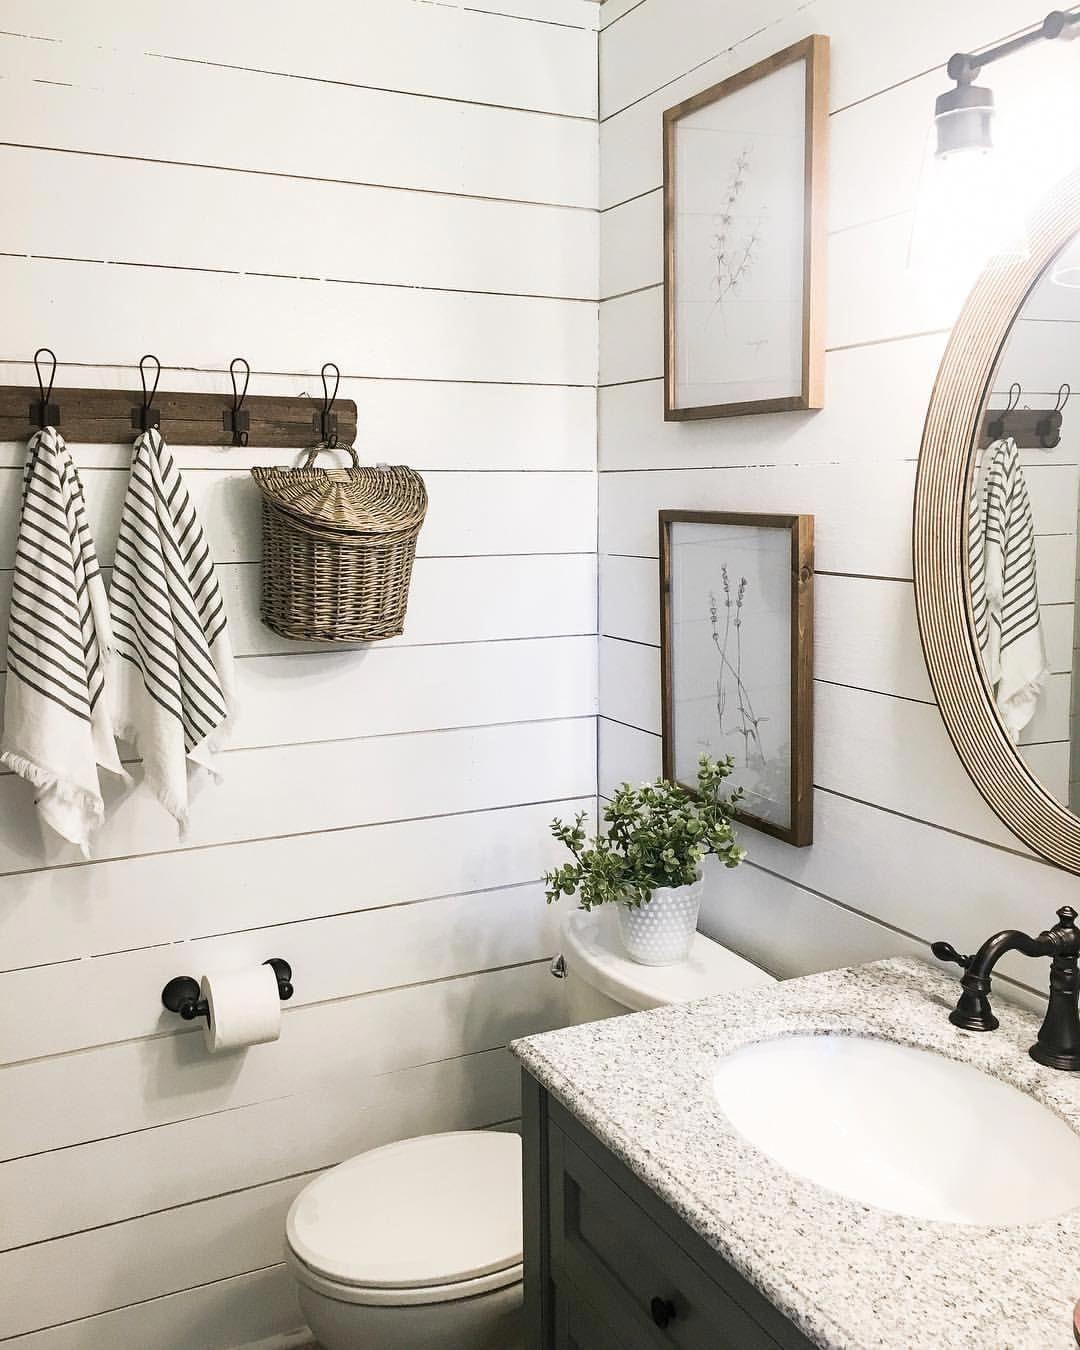 Explore Wood Plank Walls Bathroom Half Baths On Pinterest See More Ideas About Best Bathroom Backspl Plank Wall Bathroom Small Bathroom Bathrooms Remodel